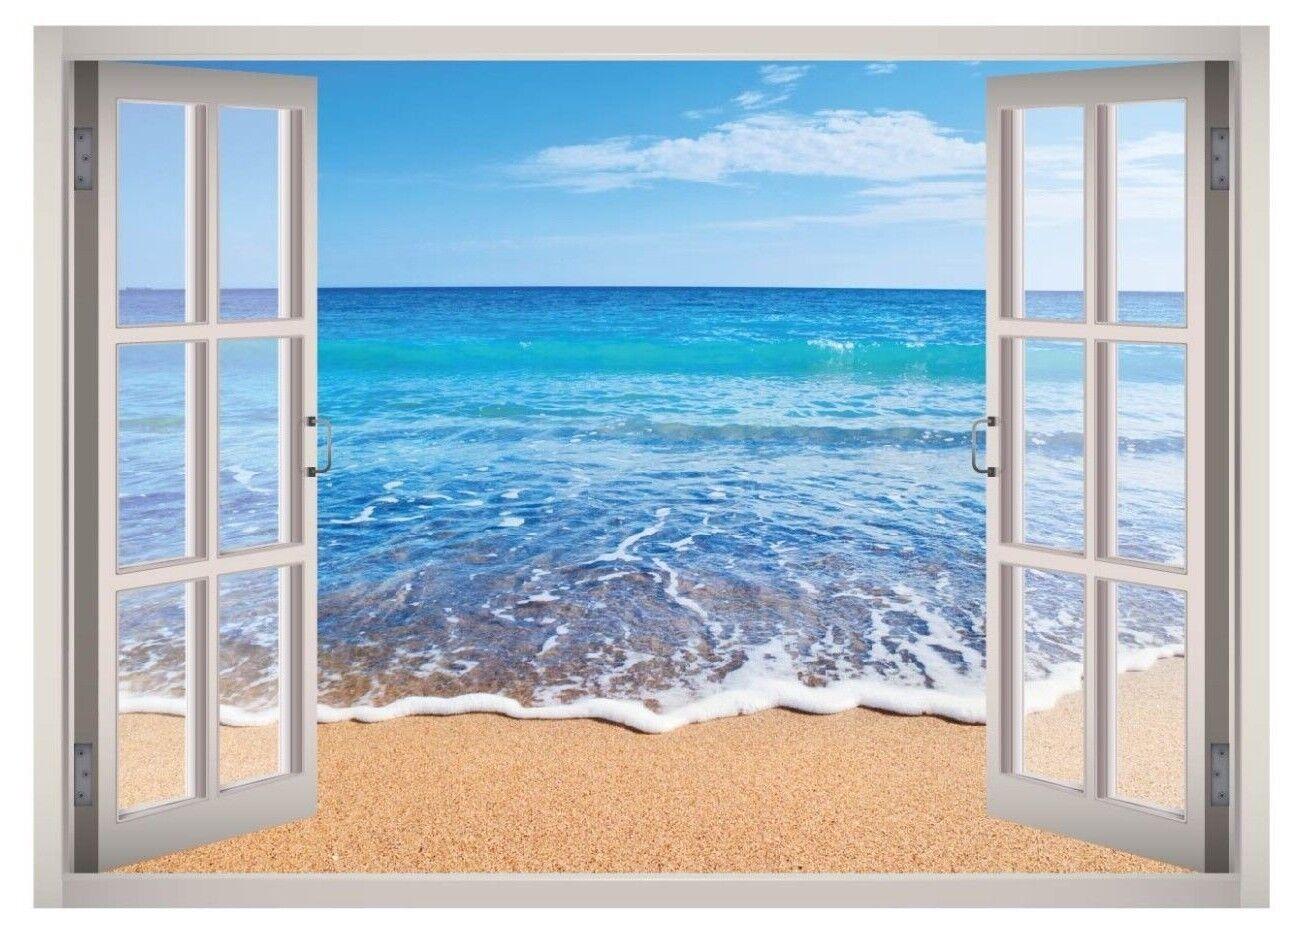 Island Beach View Window 3D Wand Decal Kunst Mural Home Decor Canvas Vinyl W07